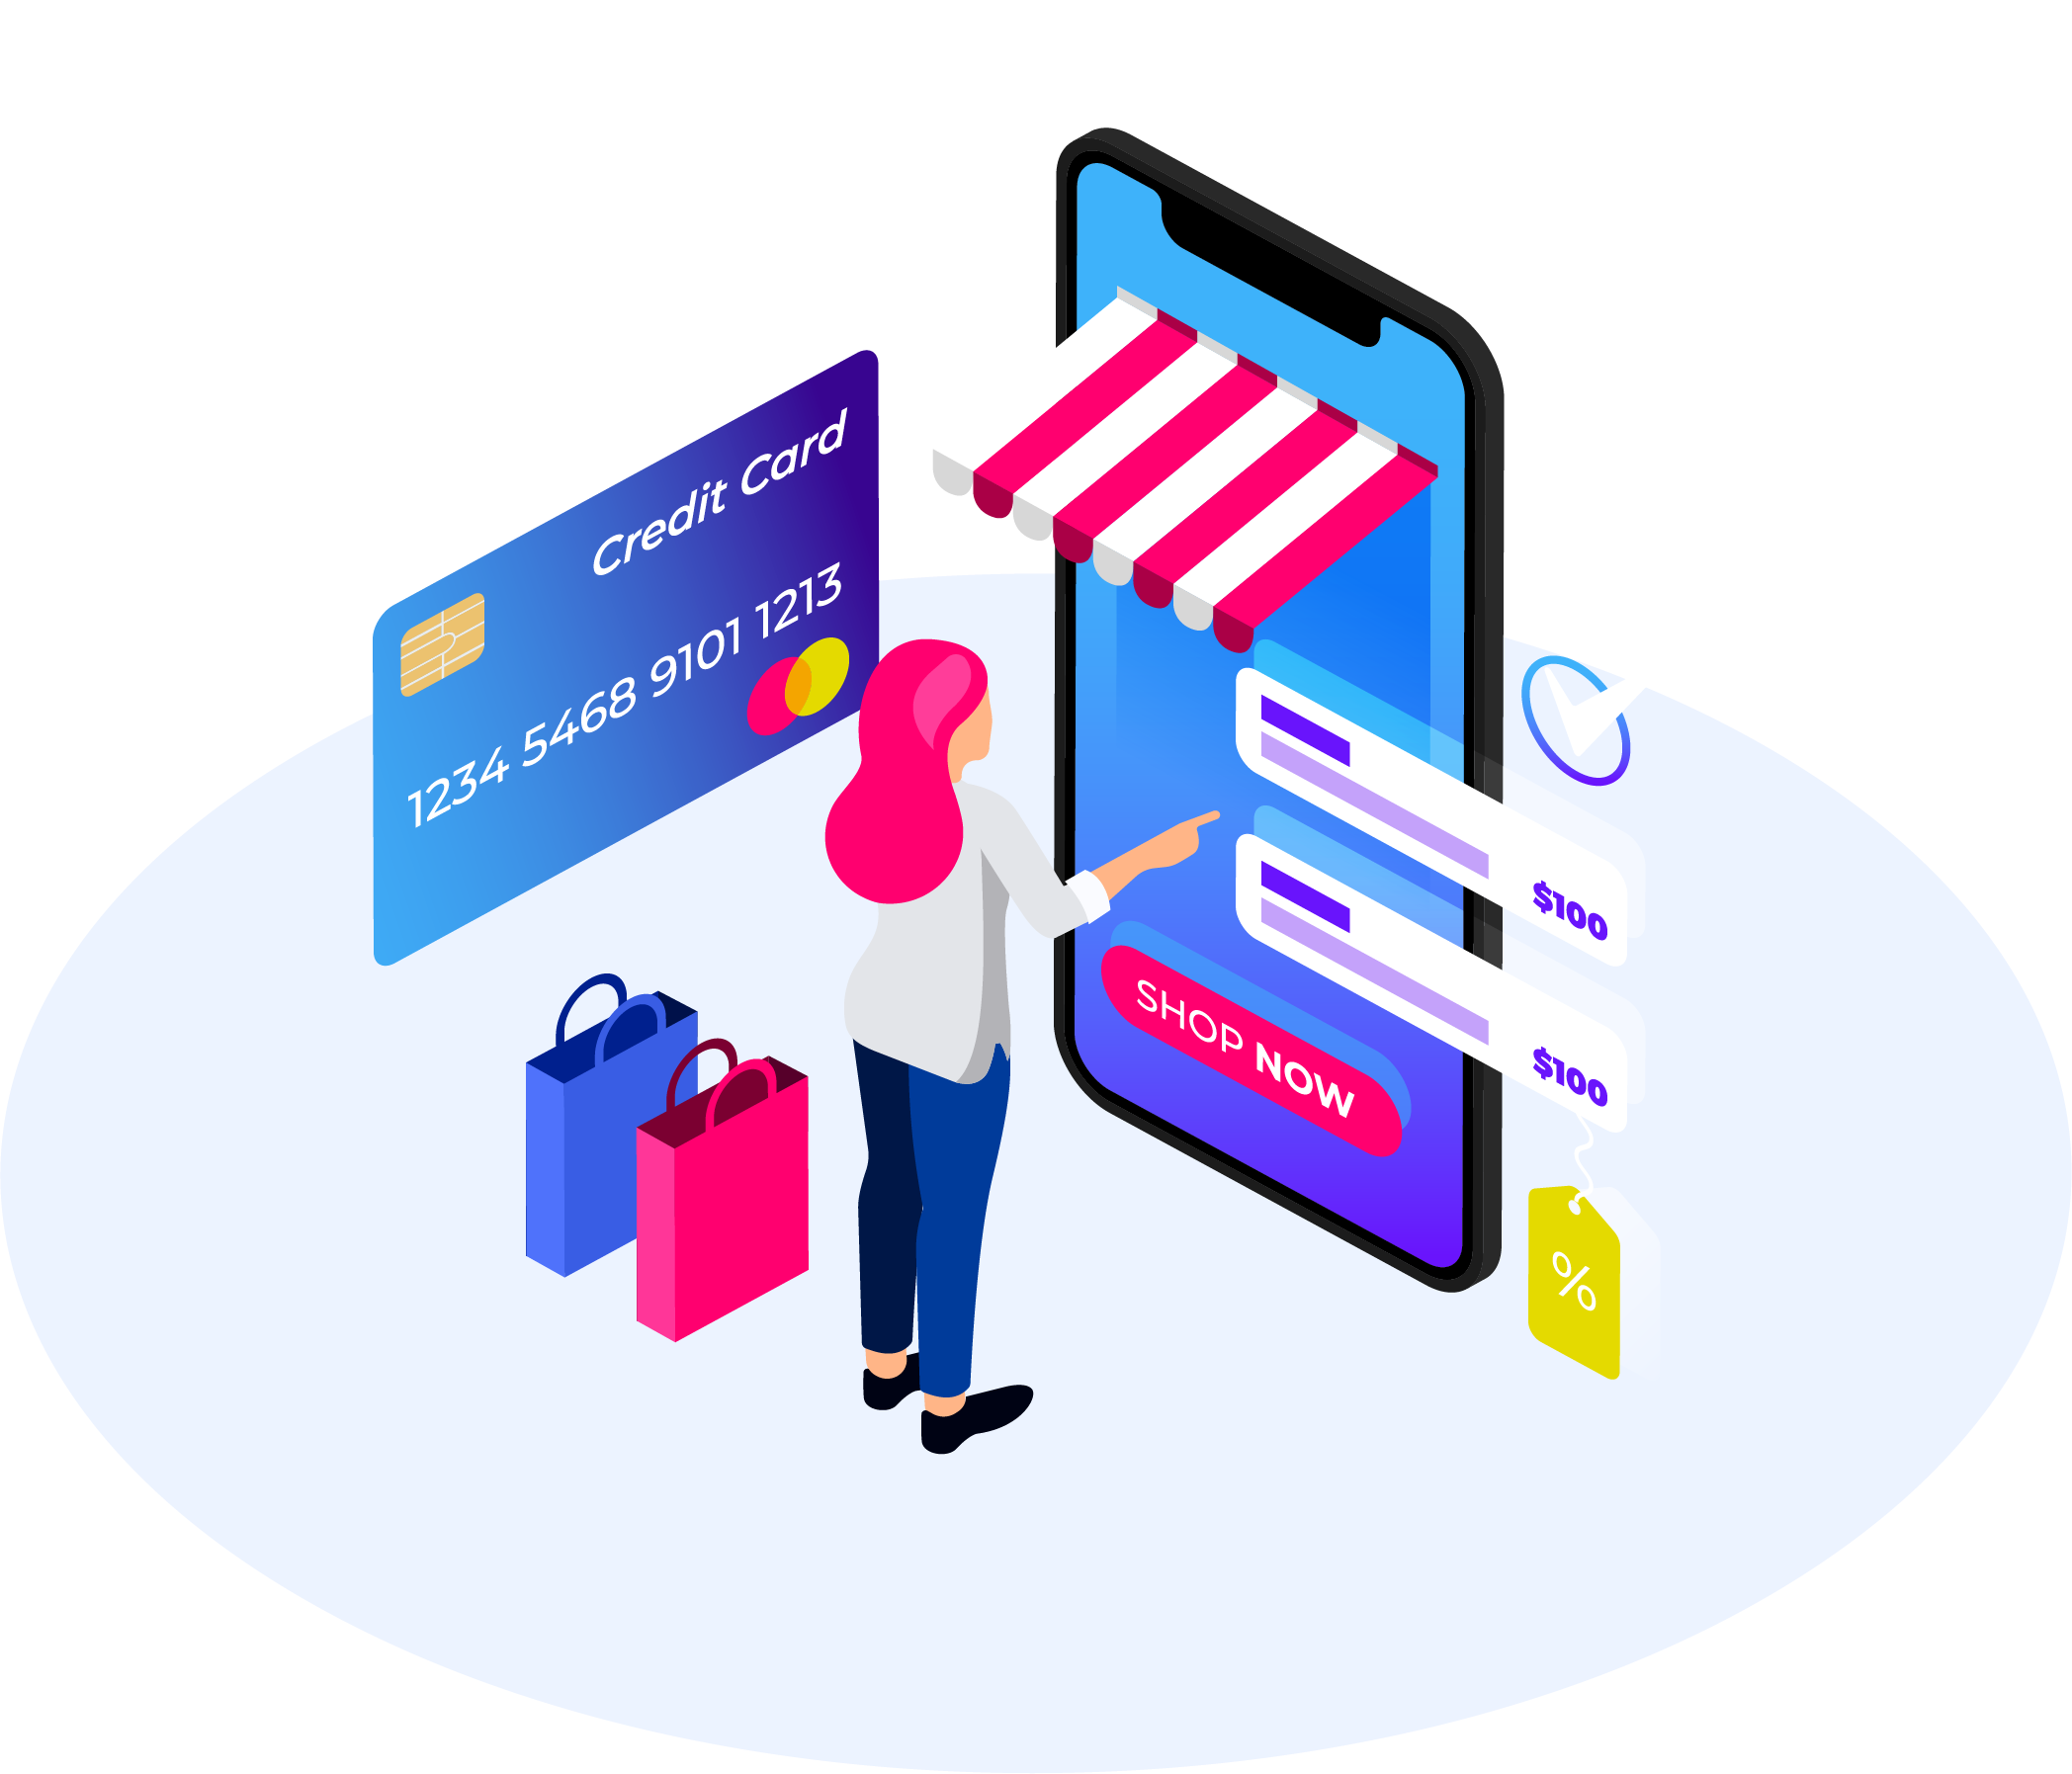 mobile commerce onectus illustration